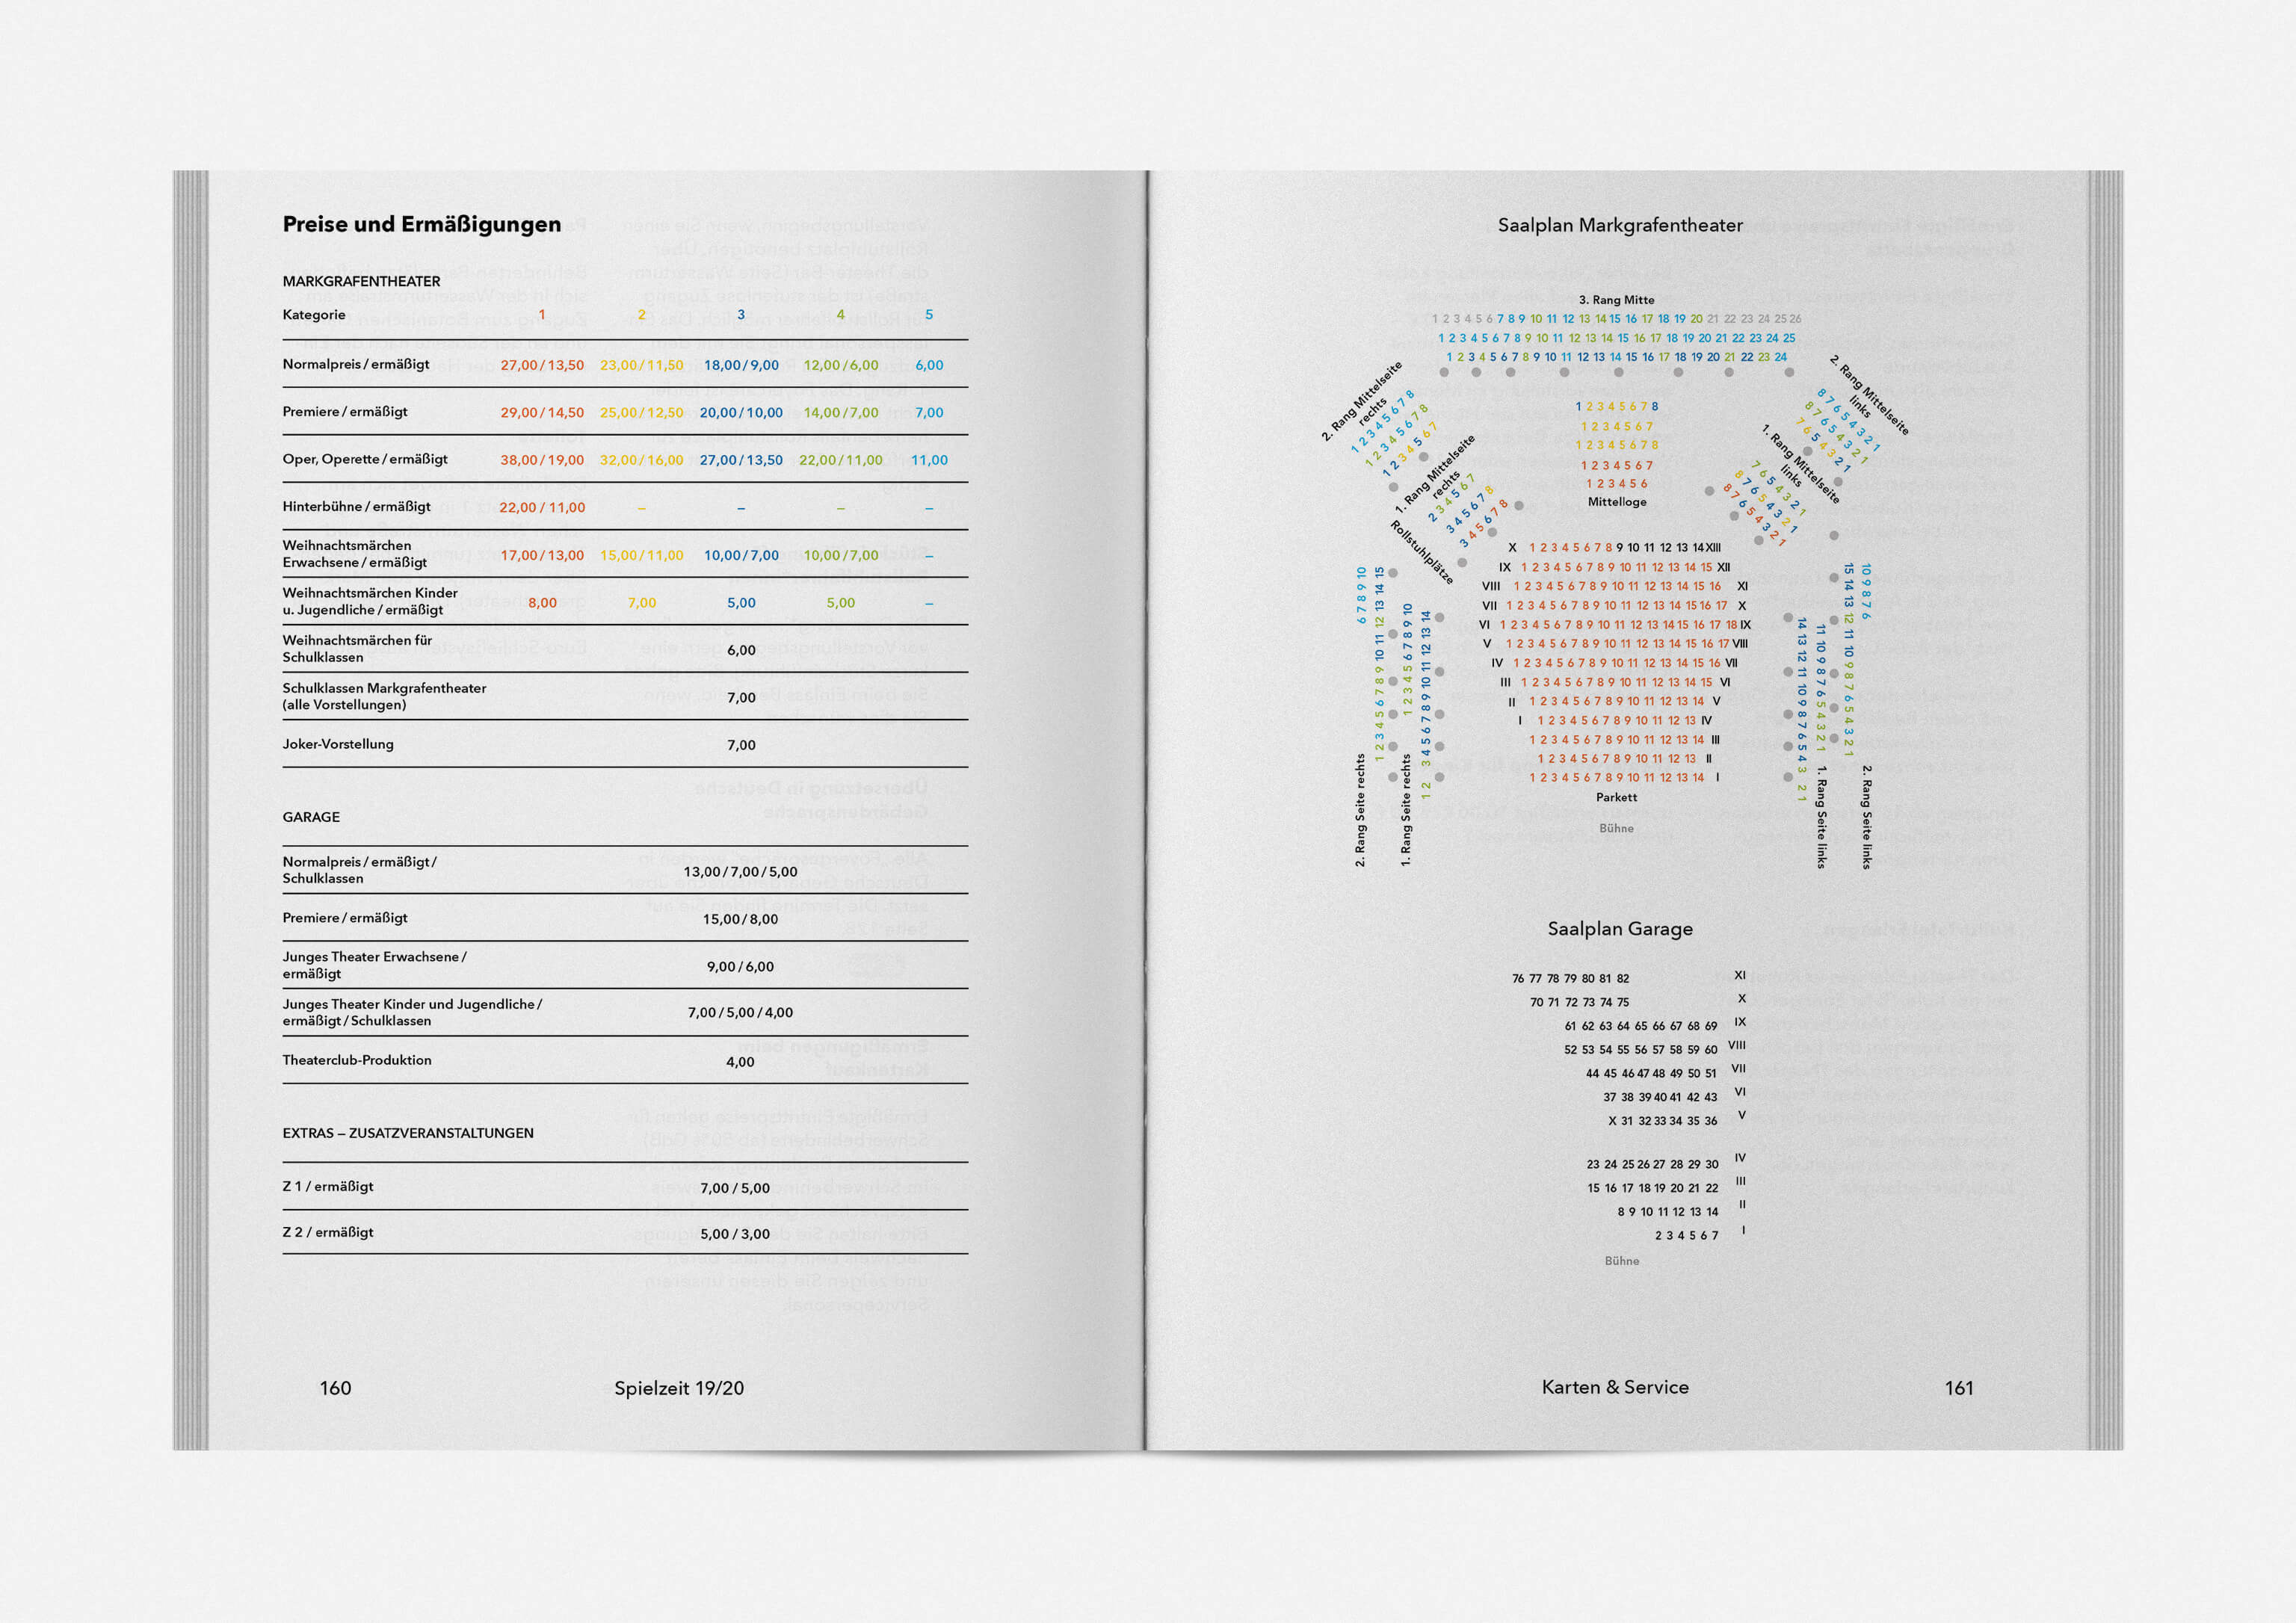 https://neuegestaltung.de/media/pages/clients/theater-erlangen-season-program-19-20/5c182cc1ed-1597415332/te_szh_19_20_innenseite_160_161_ng.jpg